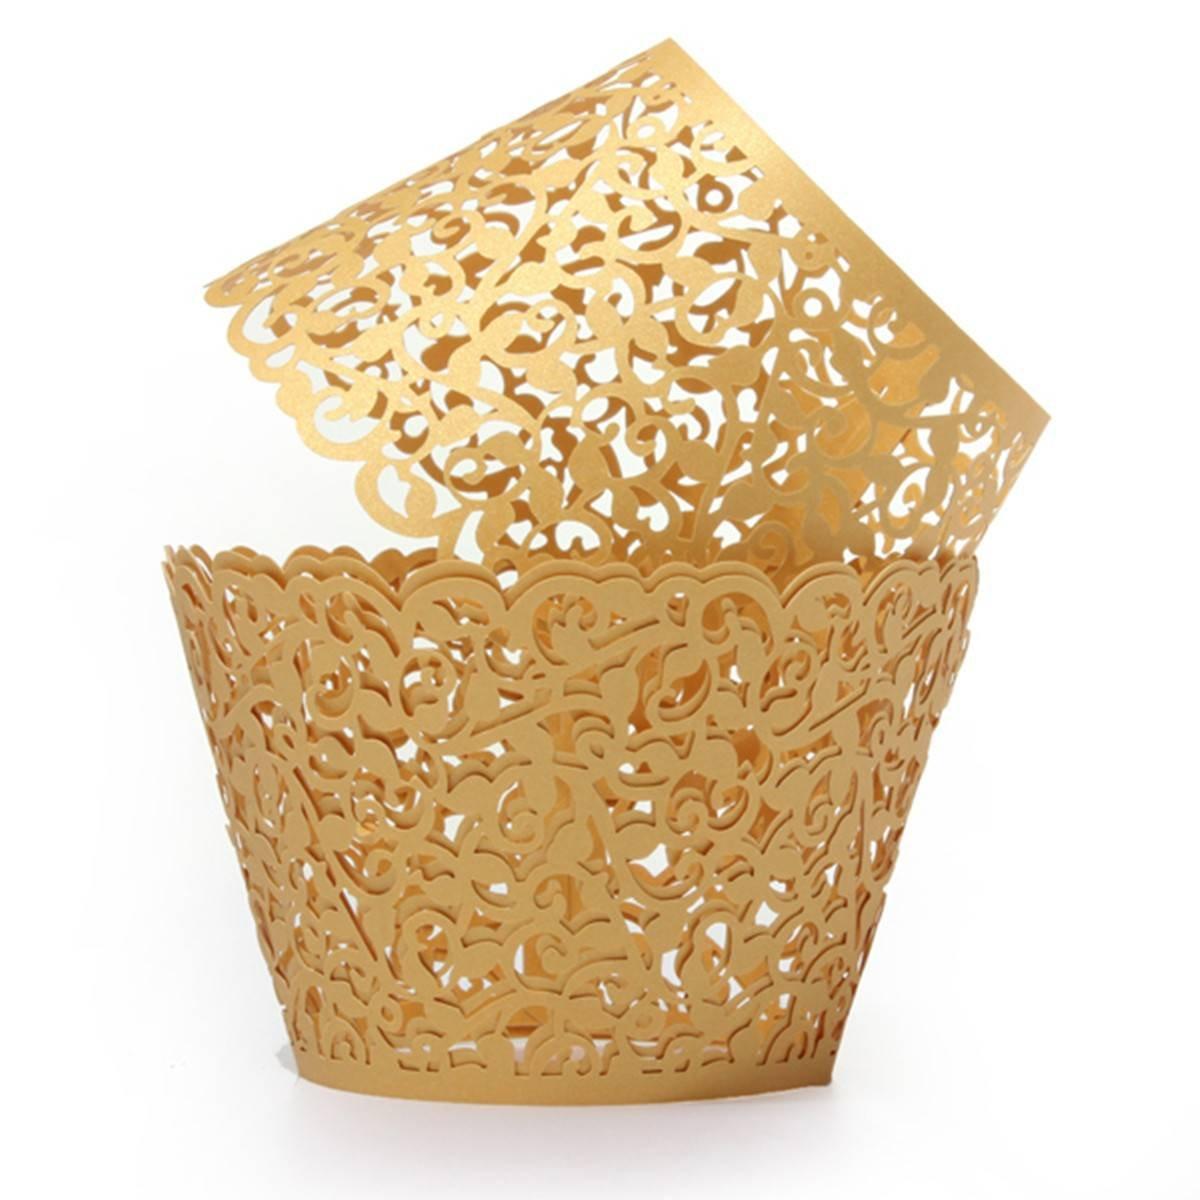 Gold Birthday Decorations Amazoncom Kingso 12pcs Filigree Vine Cupcake Wrappers Wraps